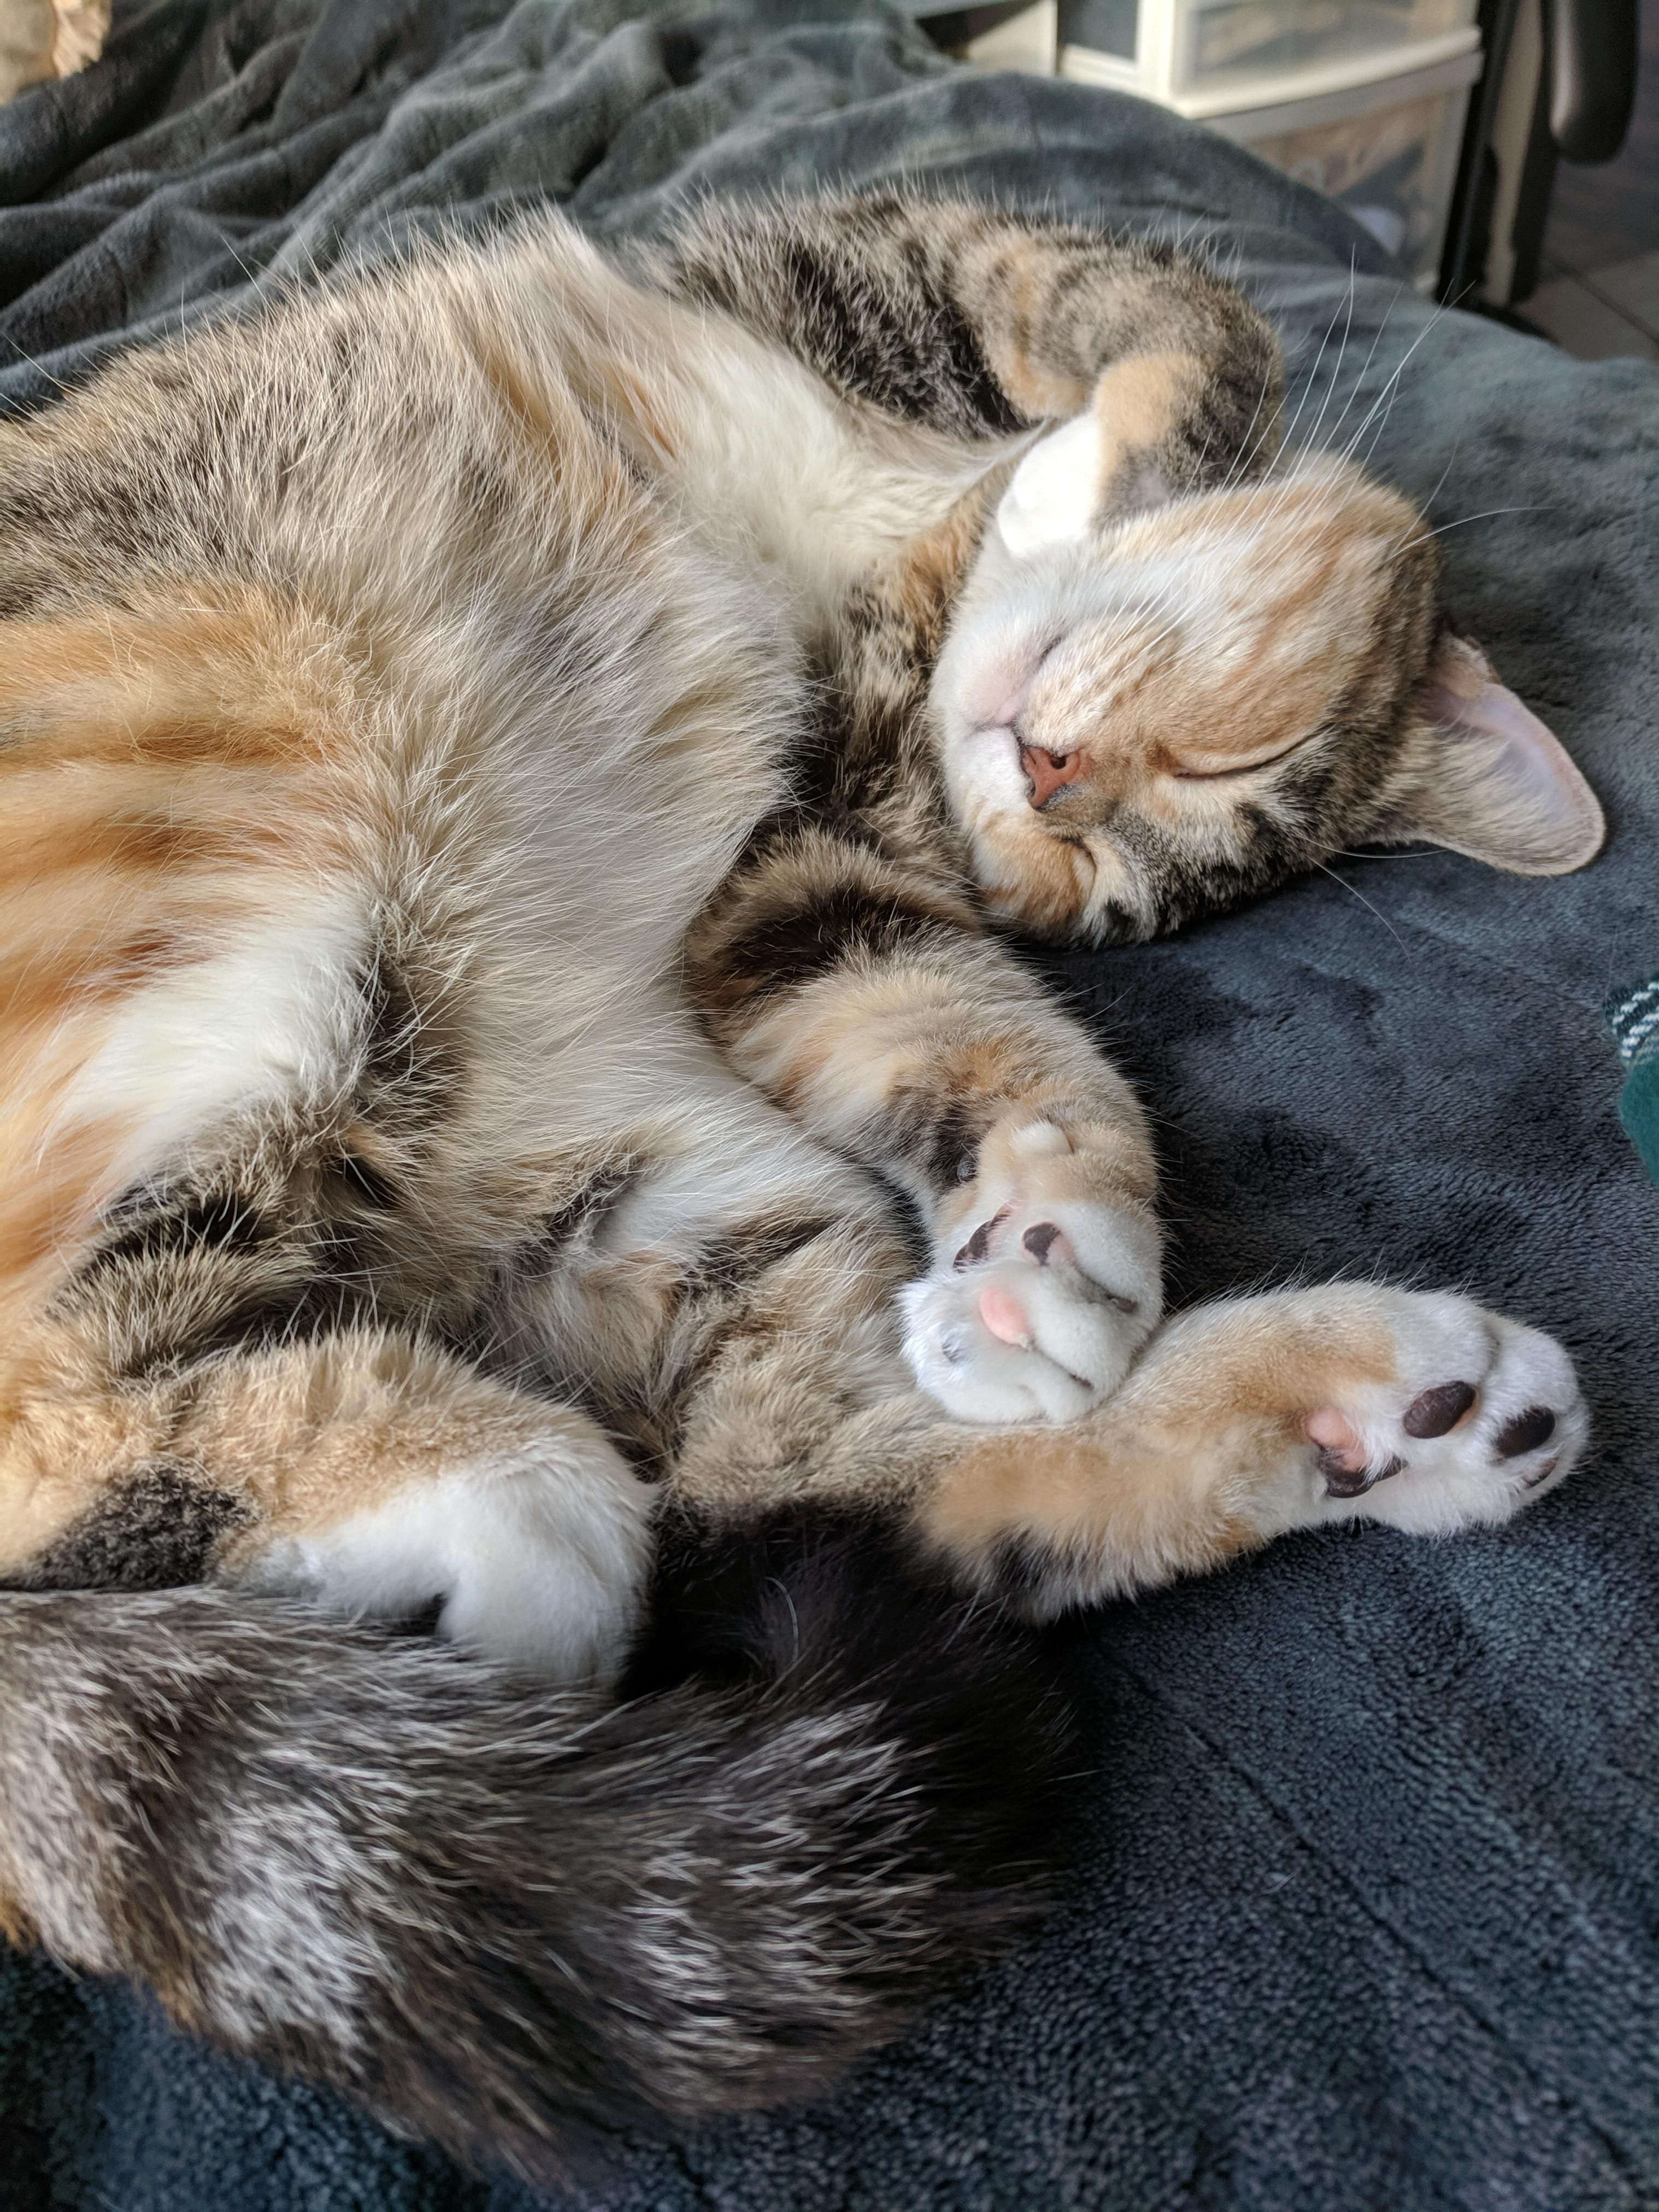 Kitty sleeps soundly during polar vortex Cats, Kitty, Sleep